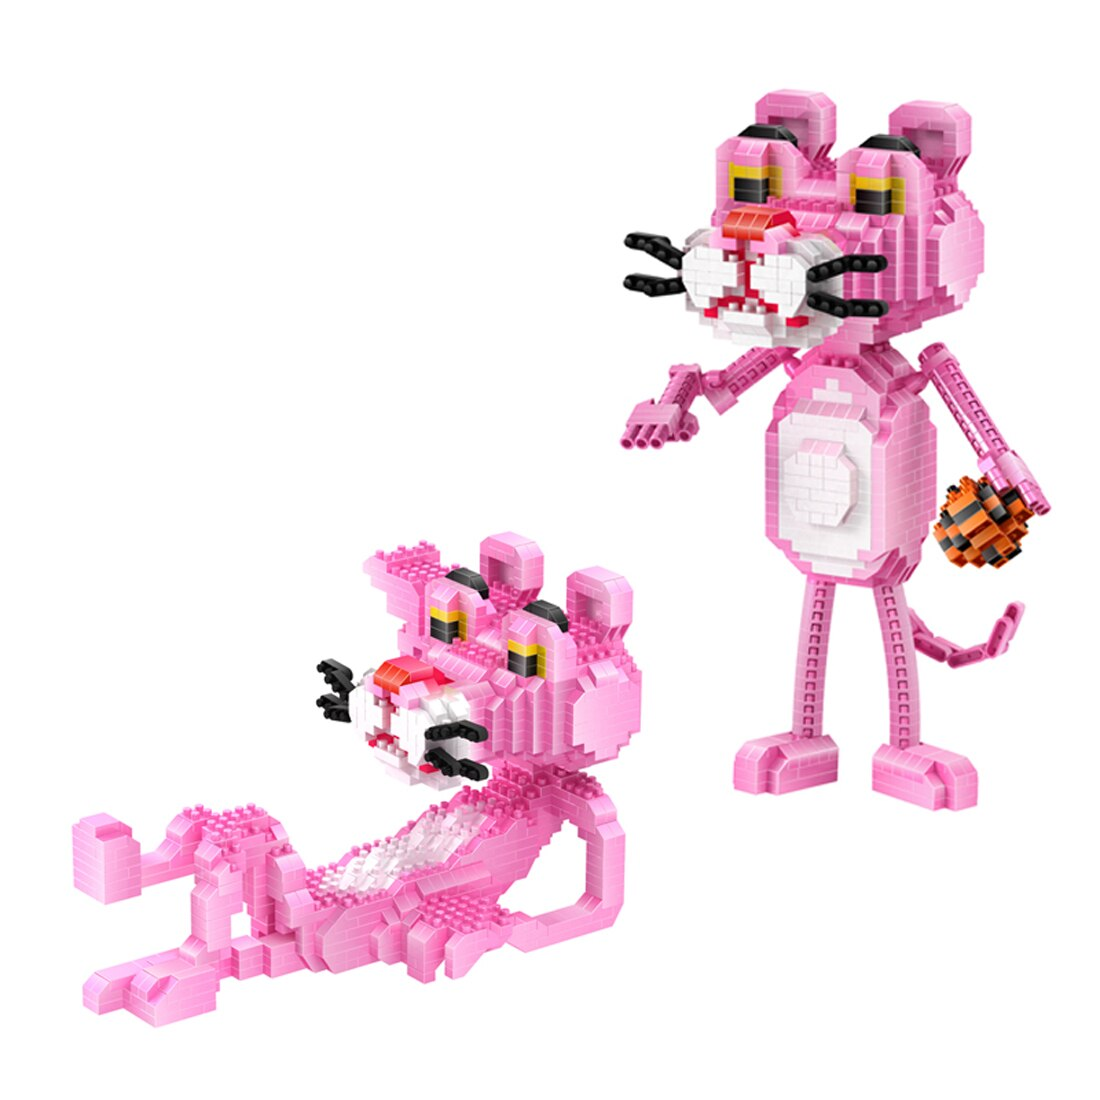 Juguetes de regalo con imagen de dibujo de animé japonés clásico de los creativos hot lepining Pantera Rosa mini modelo de bloques de construcción de micro diamantes